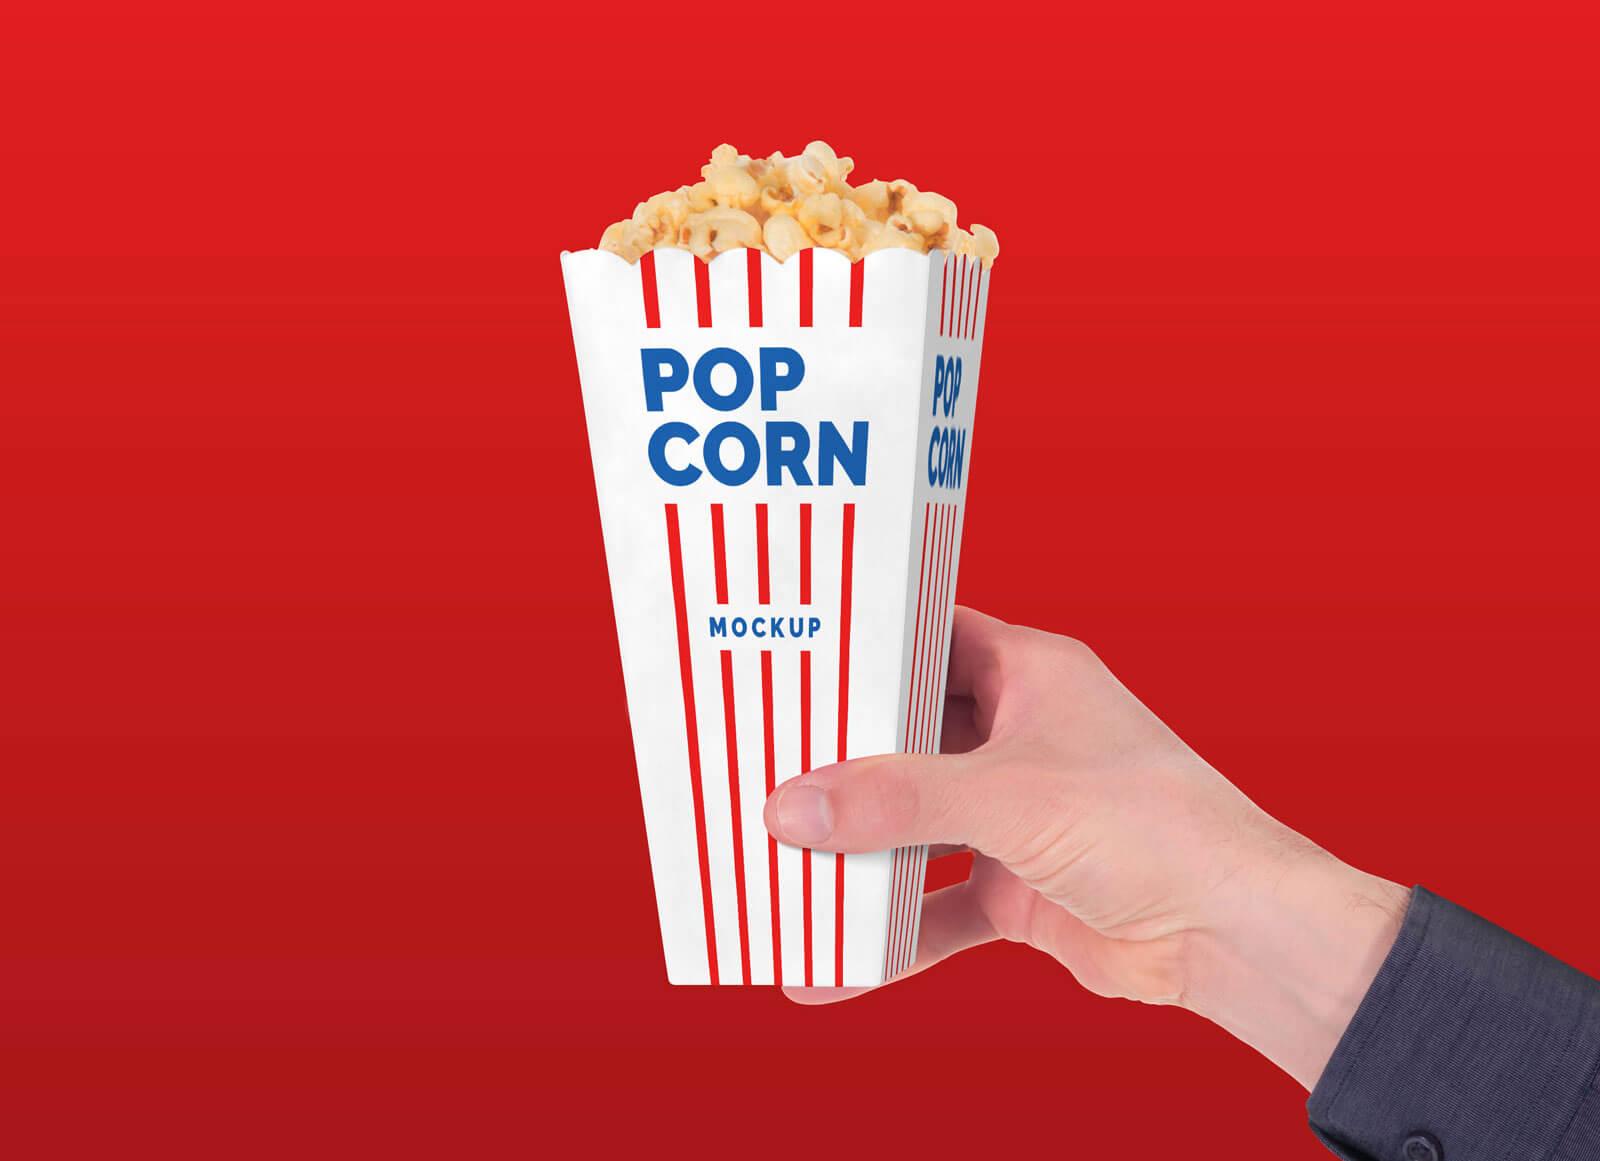 free-movie-theater-popcorn-paper-box-mockup-psd